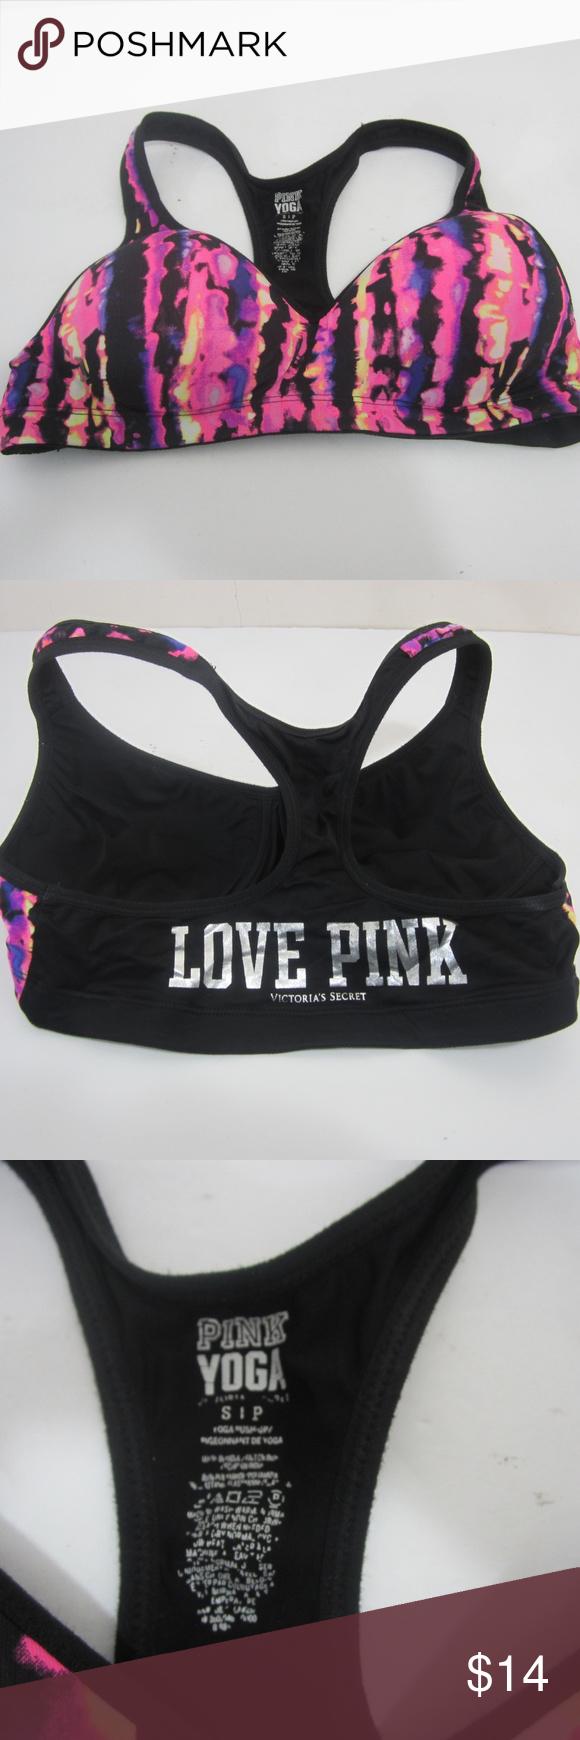 d68a627578520 PINK Victoria s Secret Sports Bra Womens S PINK Victoria s Secret Yoga  Fitness Athletic Sports Bra Women s